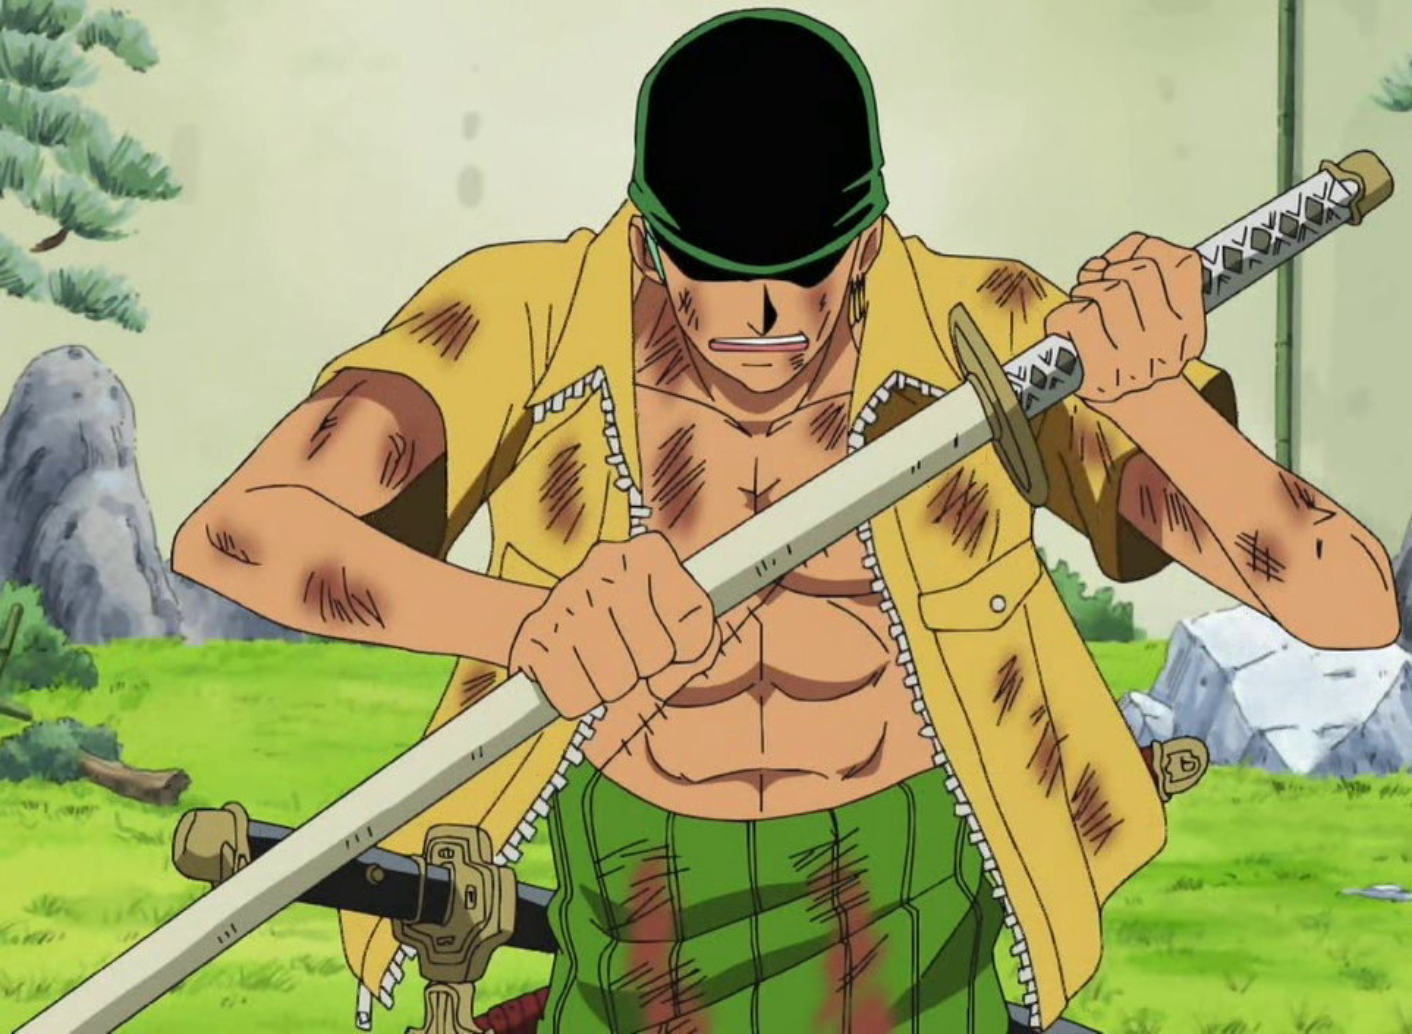 Wado Ichimonji - The One Piece Wiki - Manga, Anime, Pirates, Marines, Treasure, Devil Fruits ...